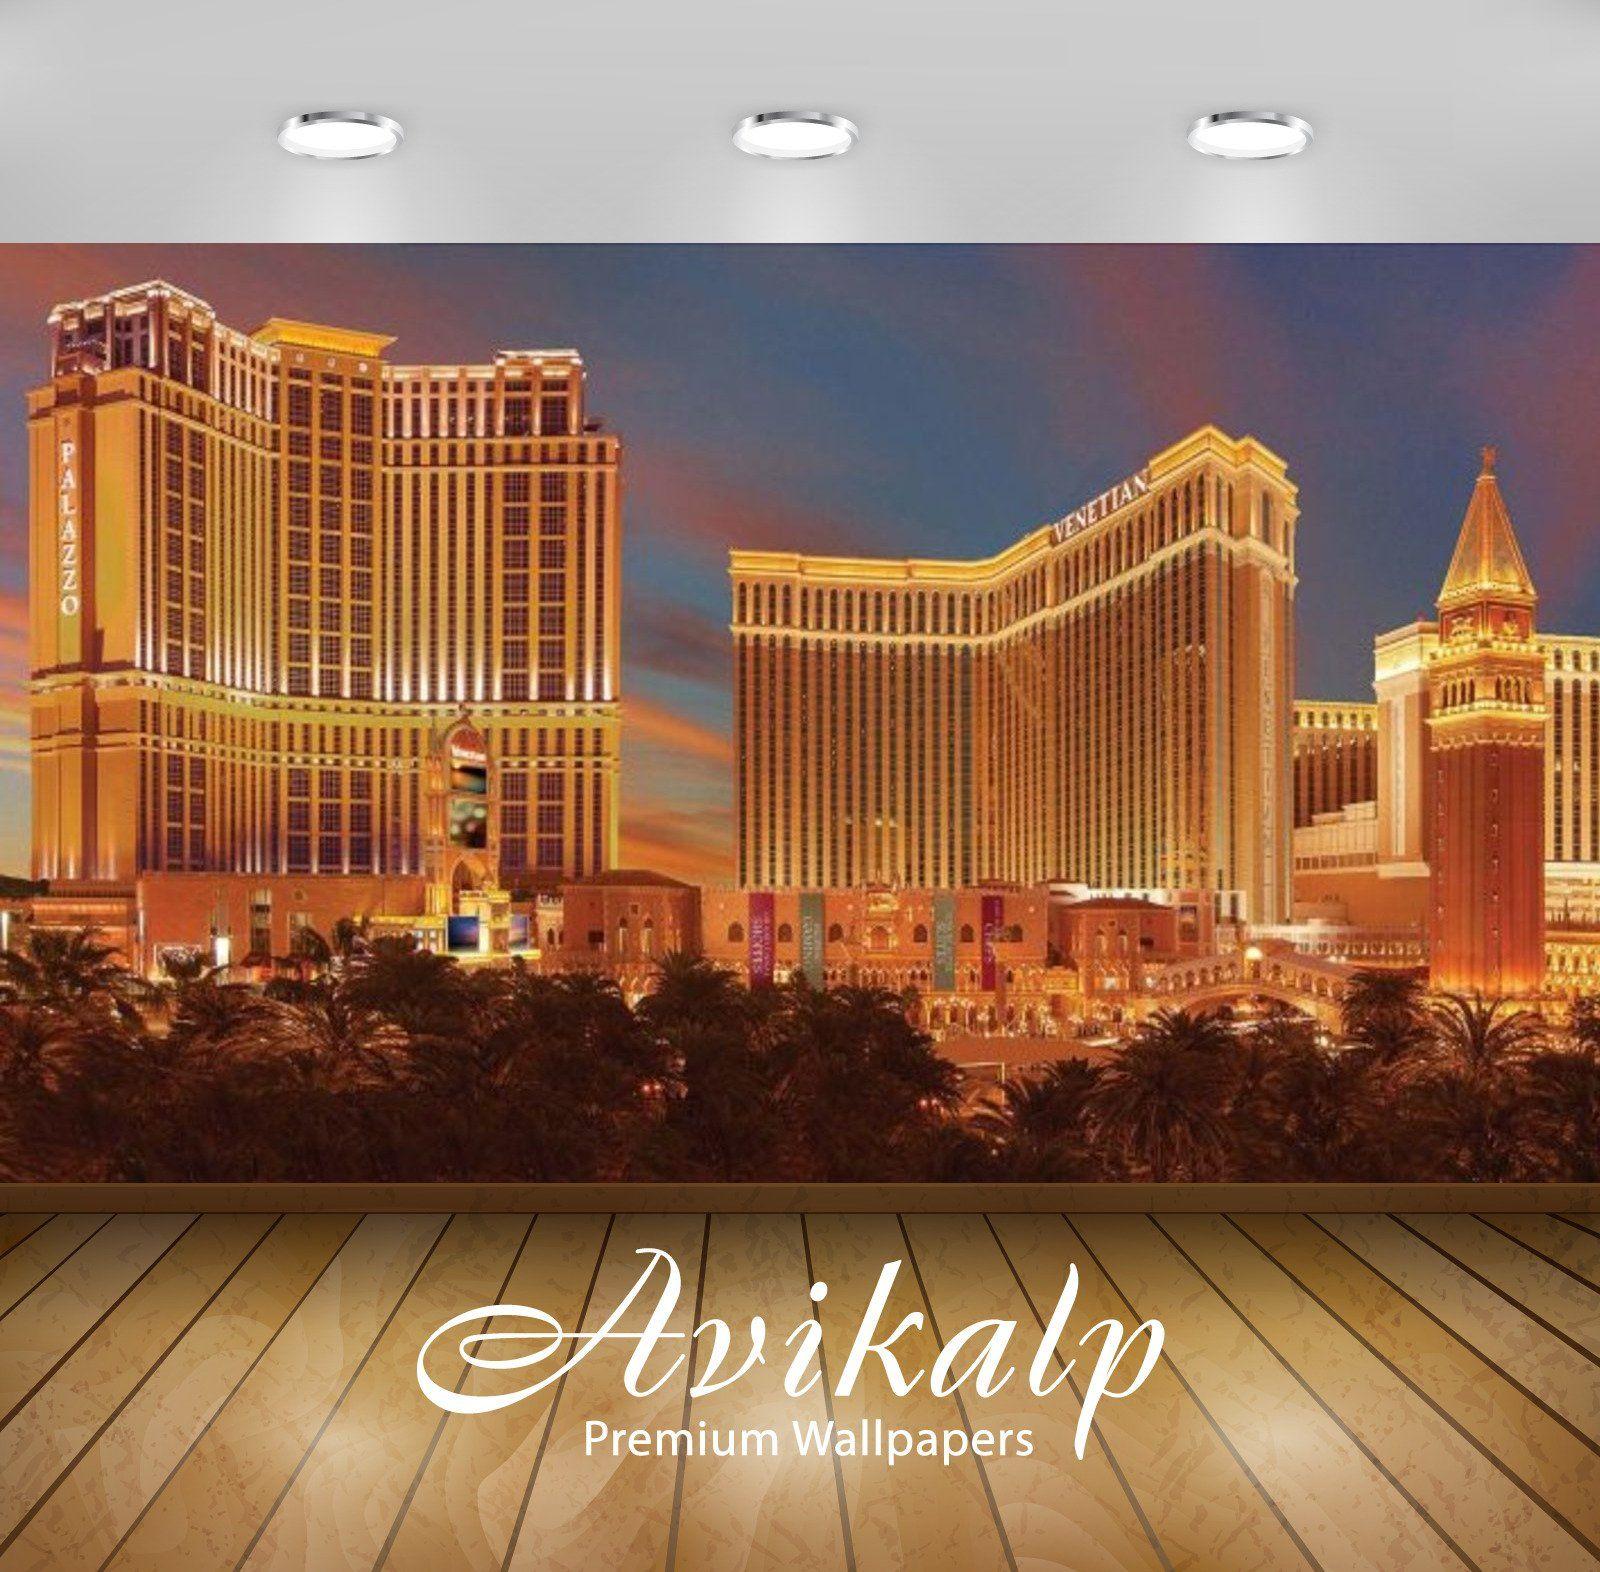 Avikalp Exclusive Awi3140 The Las Vegas Boulevard